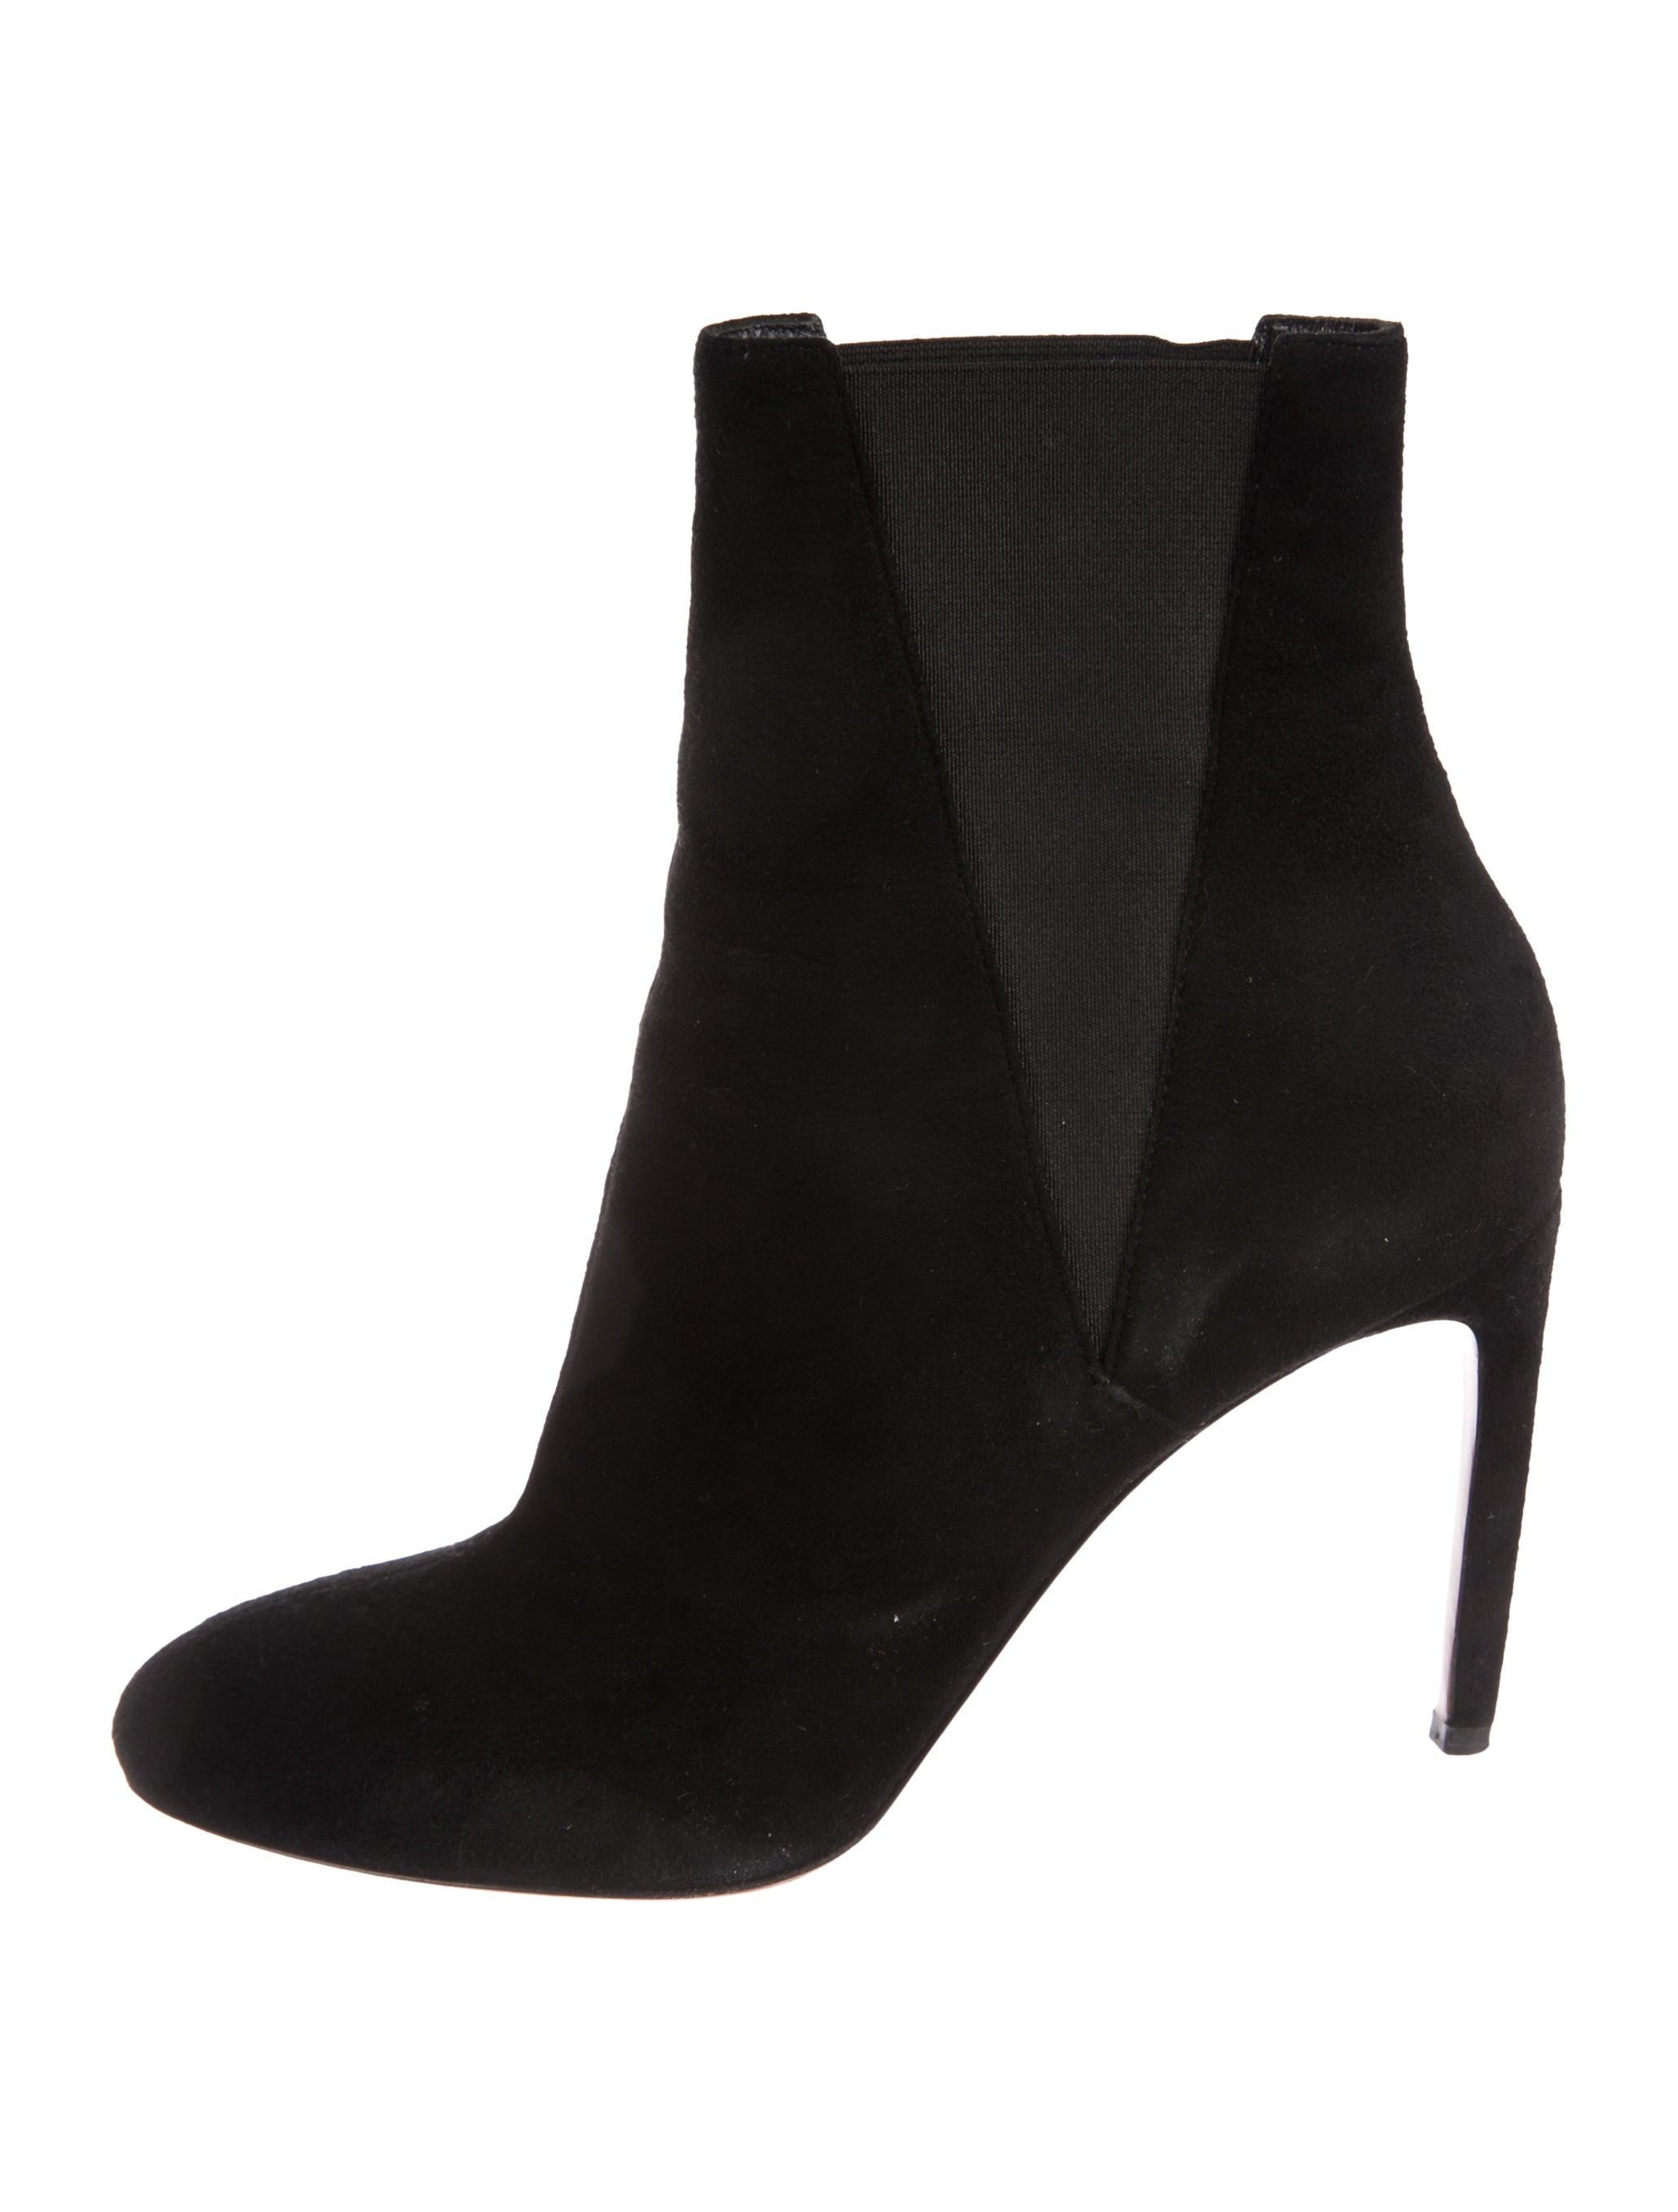 Alaïa Round-Toe Ankle Boots cheap sale high quality UcWl214N0